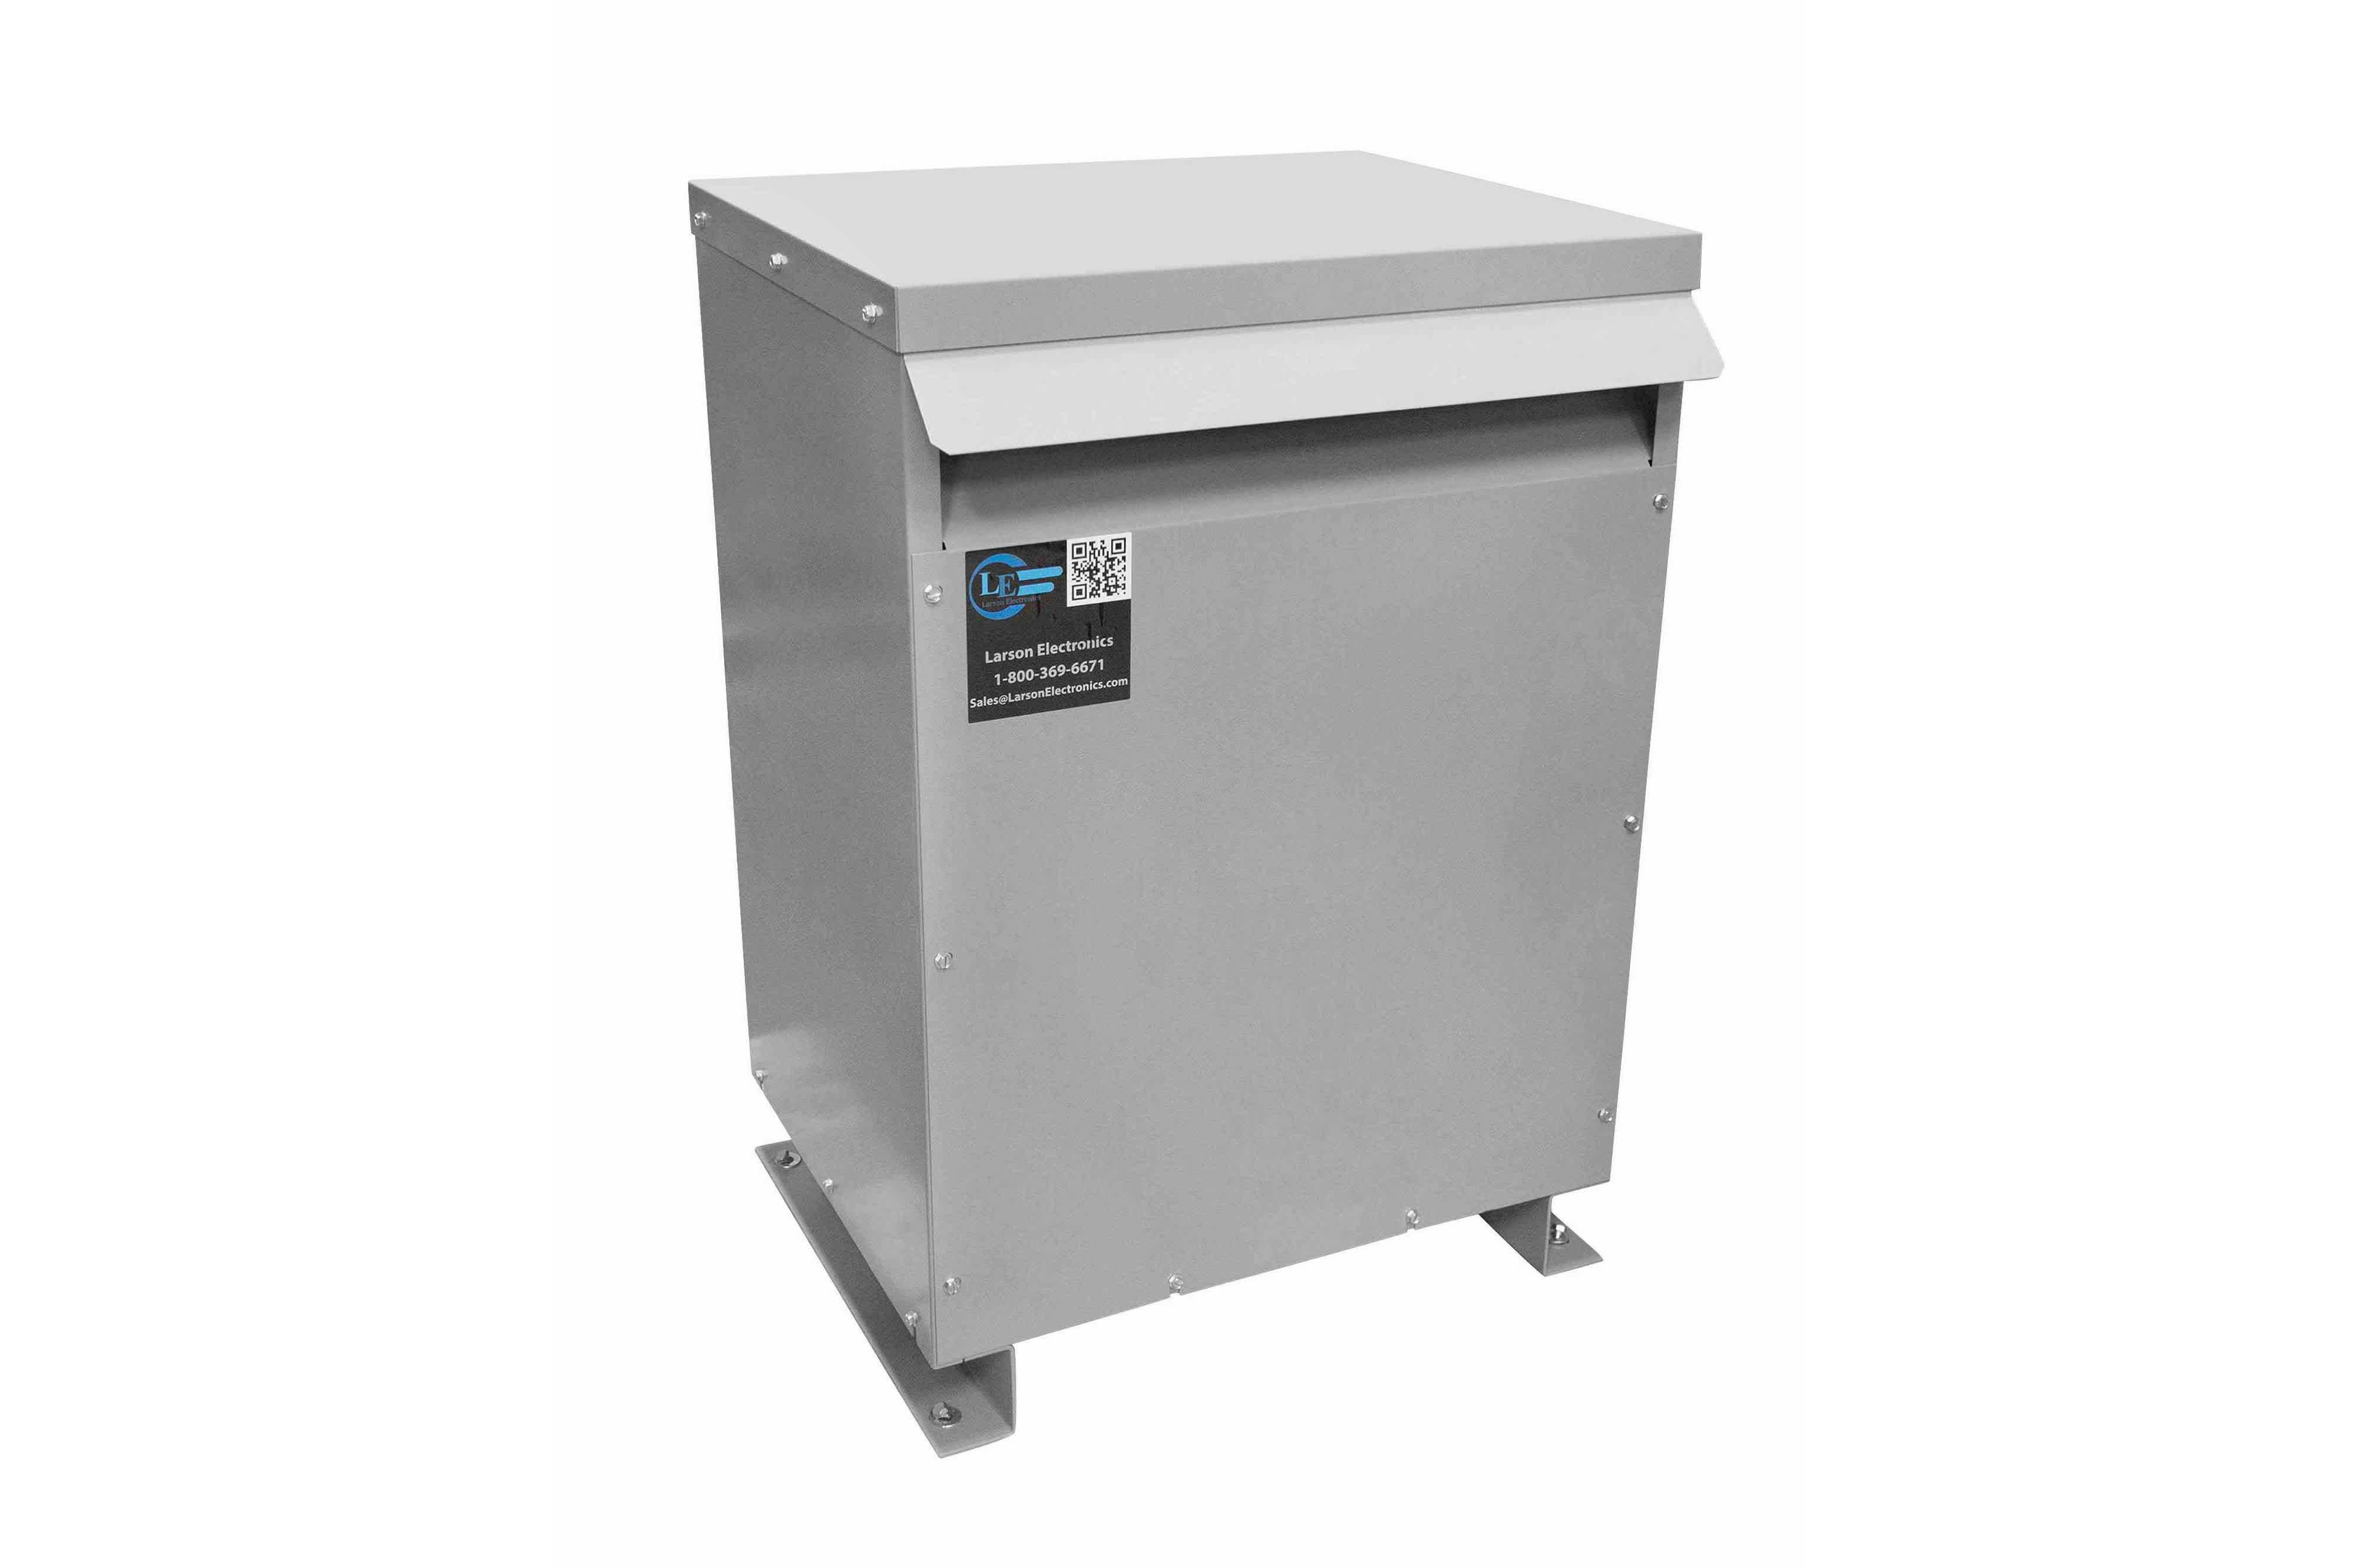 42.5 kVA 3PH Isolation Transformer, 480V Wye Primary, 600Y/347 Wye-N Secondary, N3R, Ventilated, 60 Hz